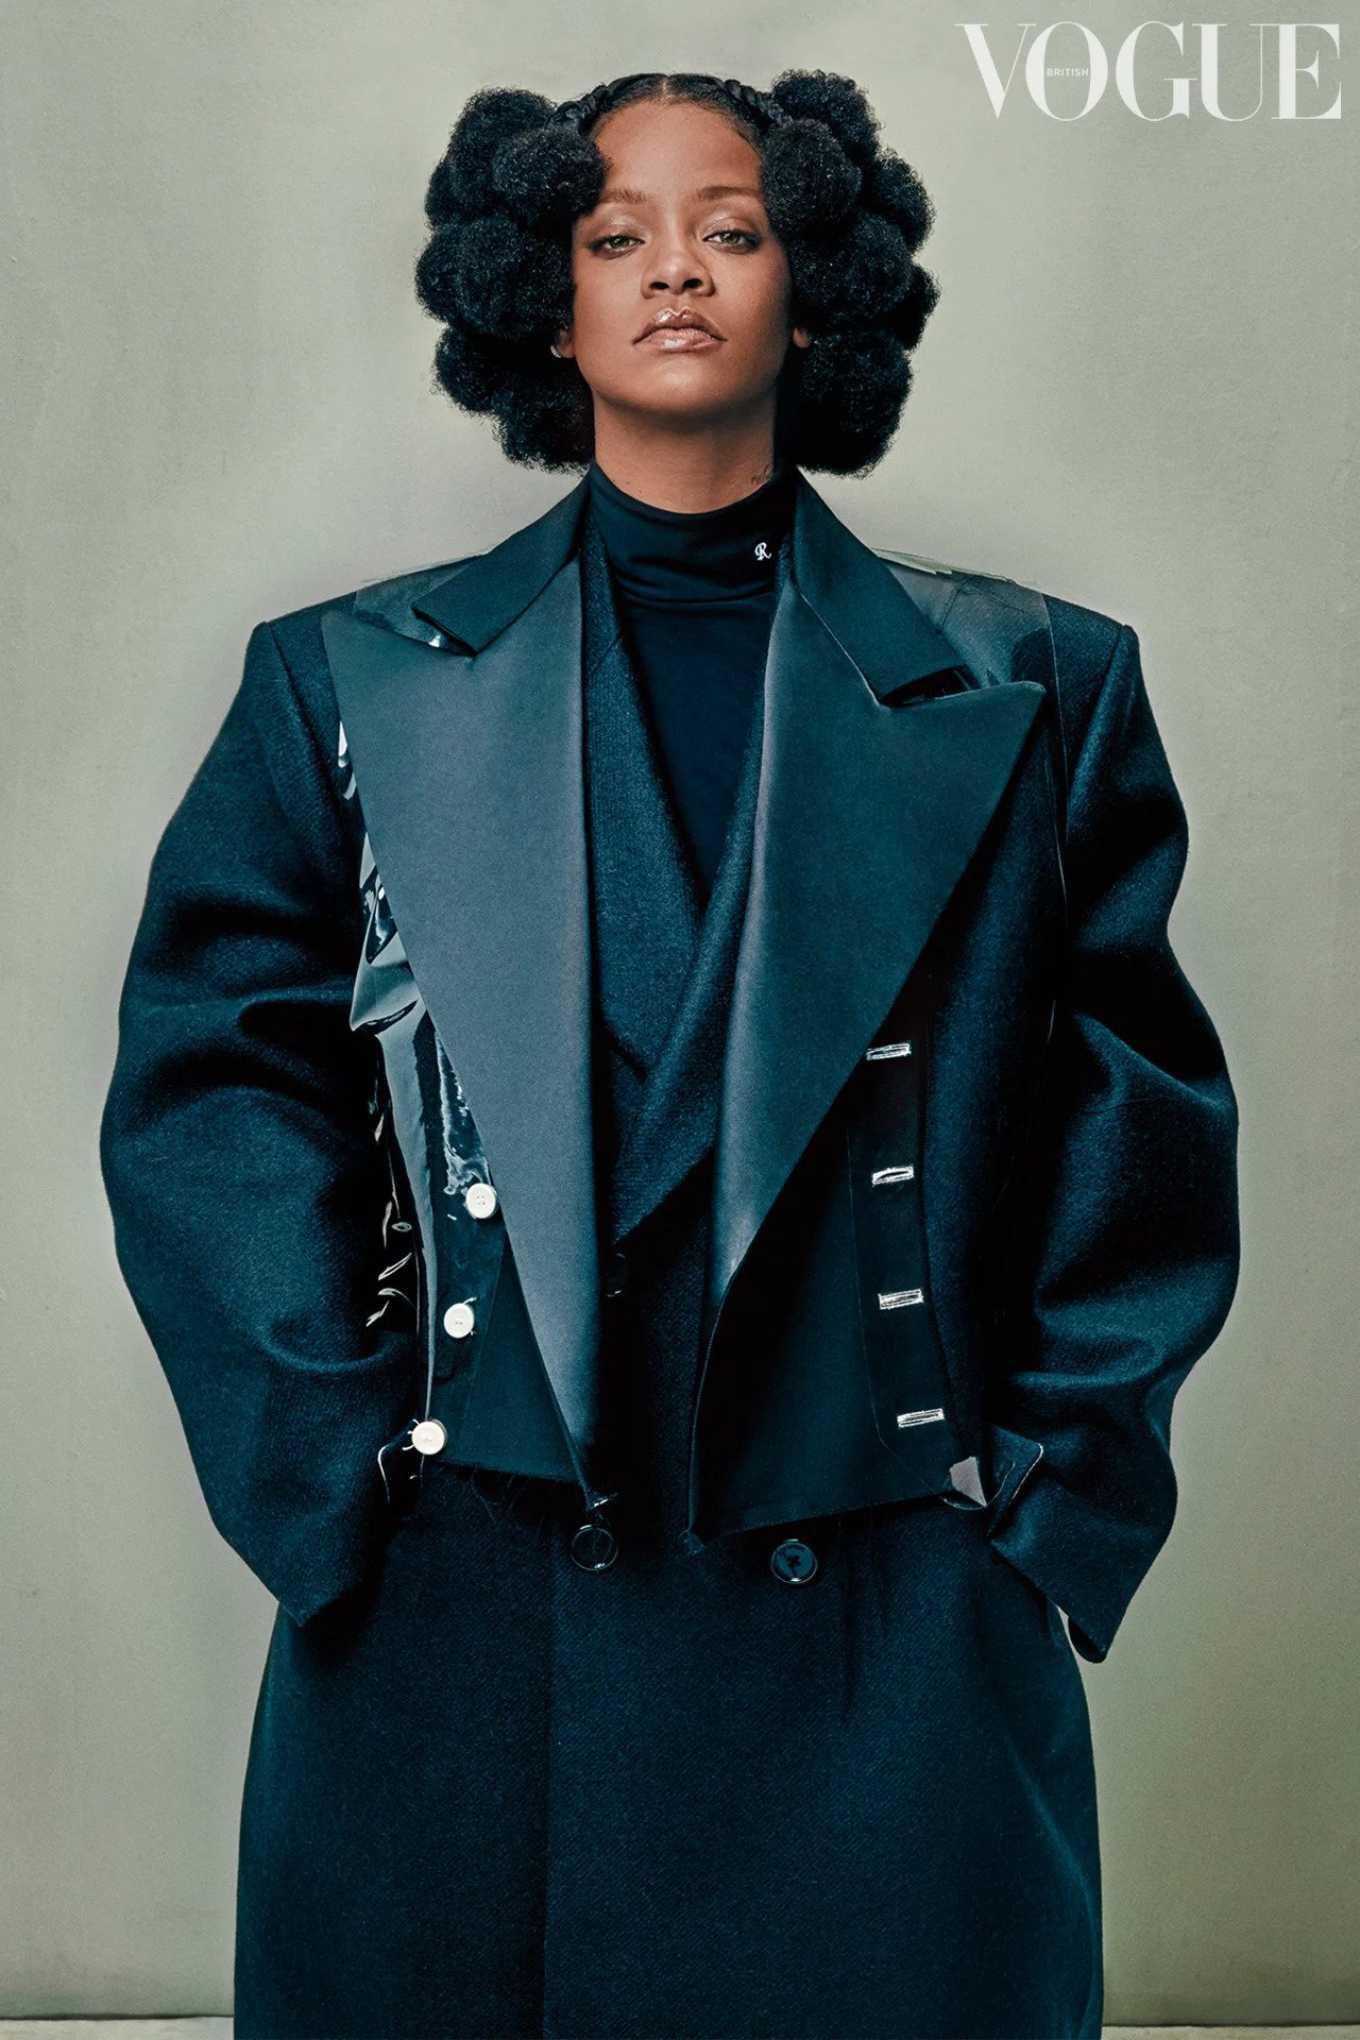 Rihanna for British Vogue Magazine (May 2020)